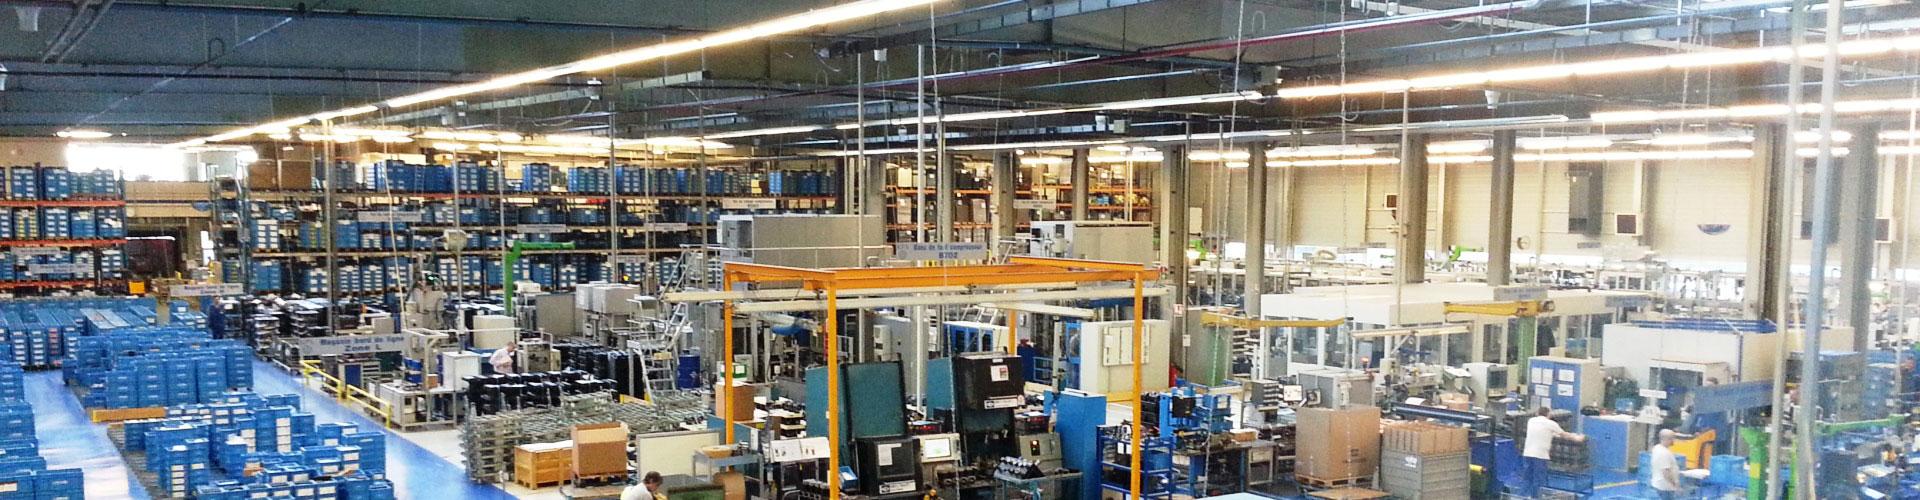 Destratification Fan System Warehouses Slider 6